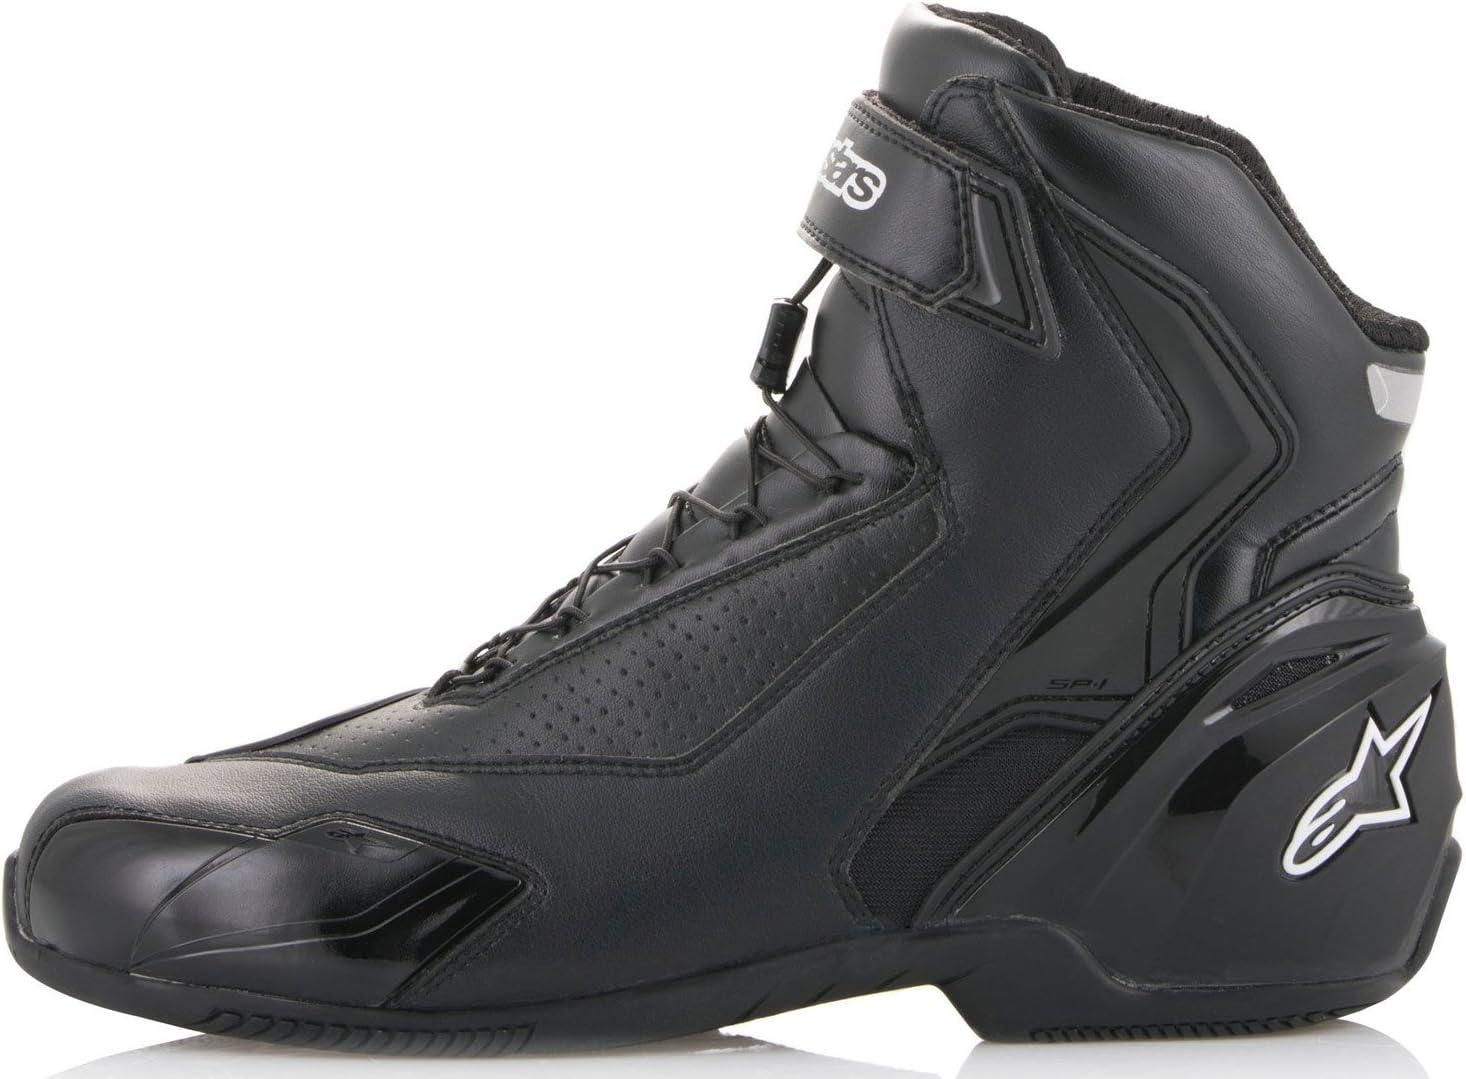 Black//White 46 Alpinestars SP-1 V2 Vented Shoes